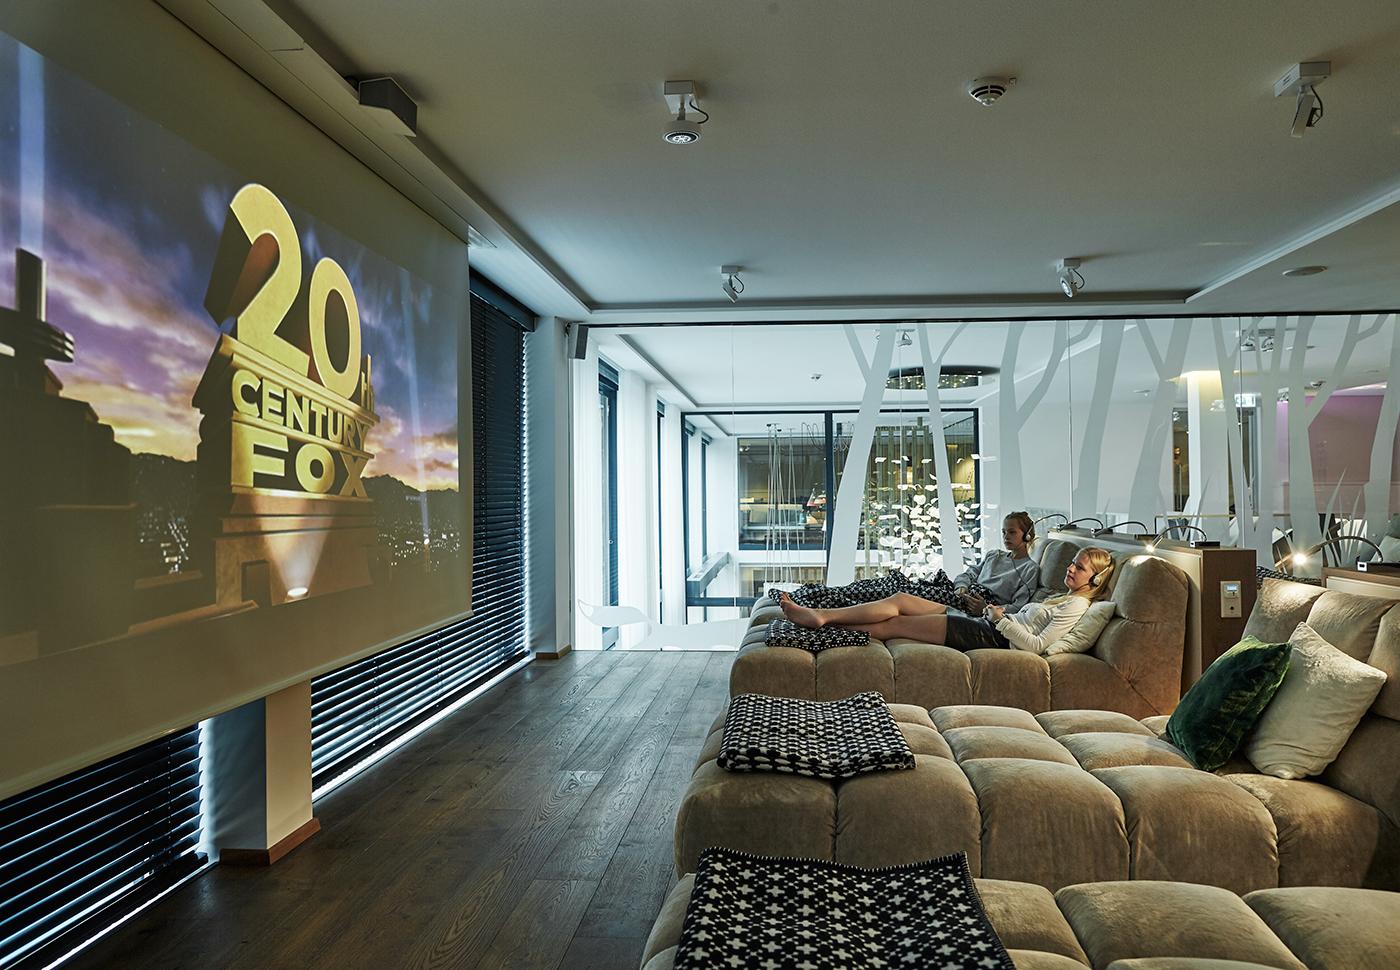 landhotel vosh vel bilder vom wellnesshotel. Black Bedroom Furniture Sets. Home Design Ideas